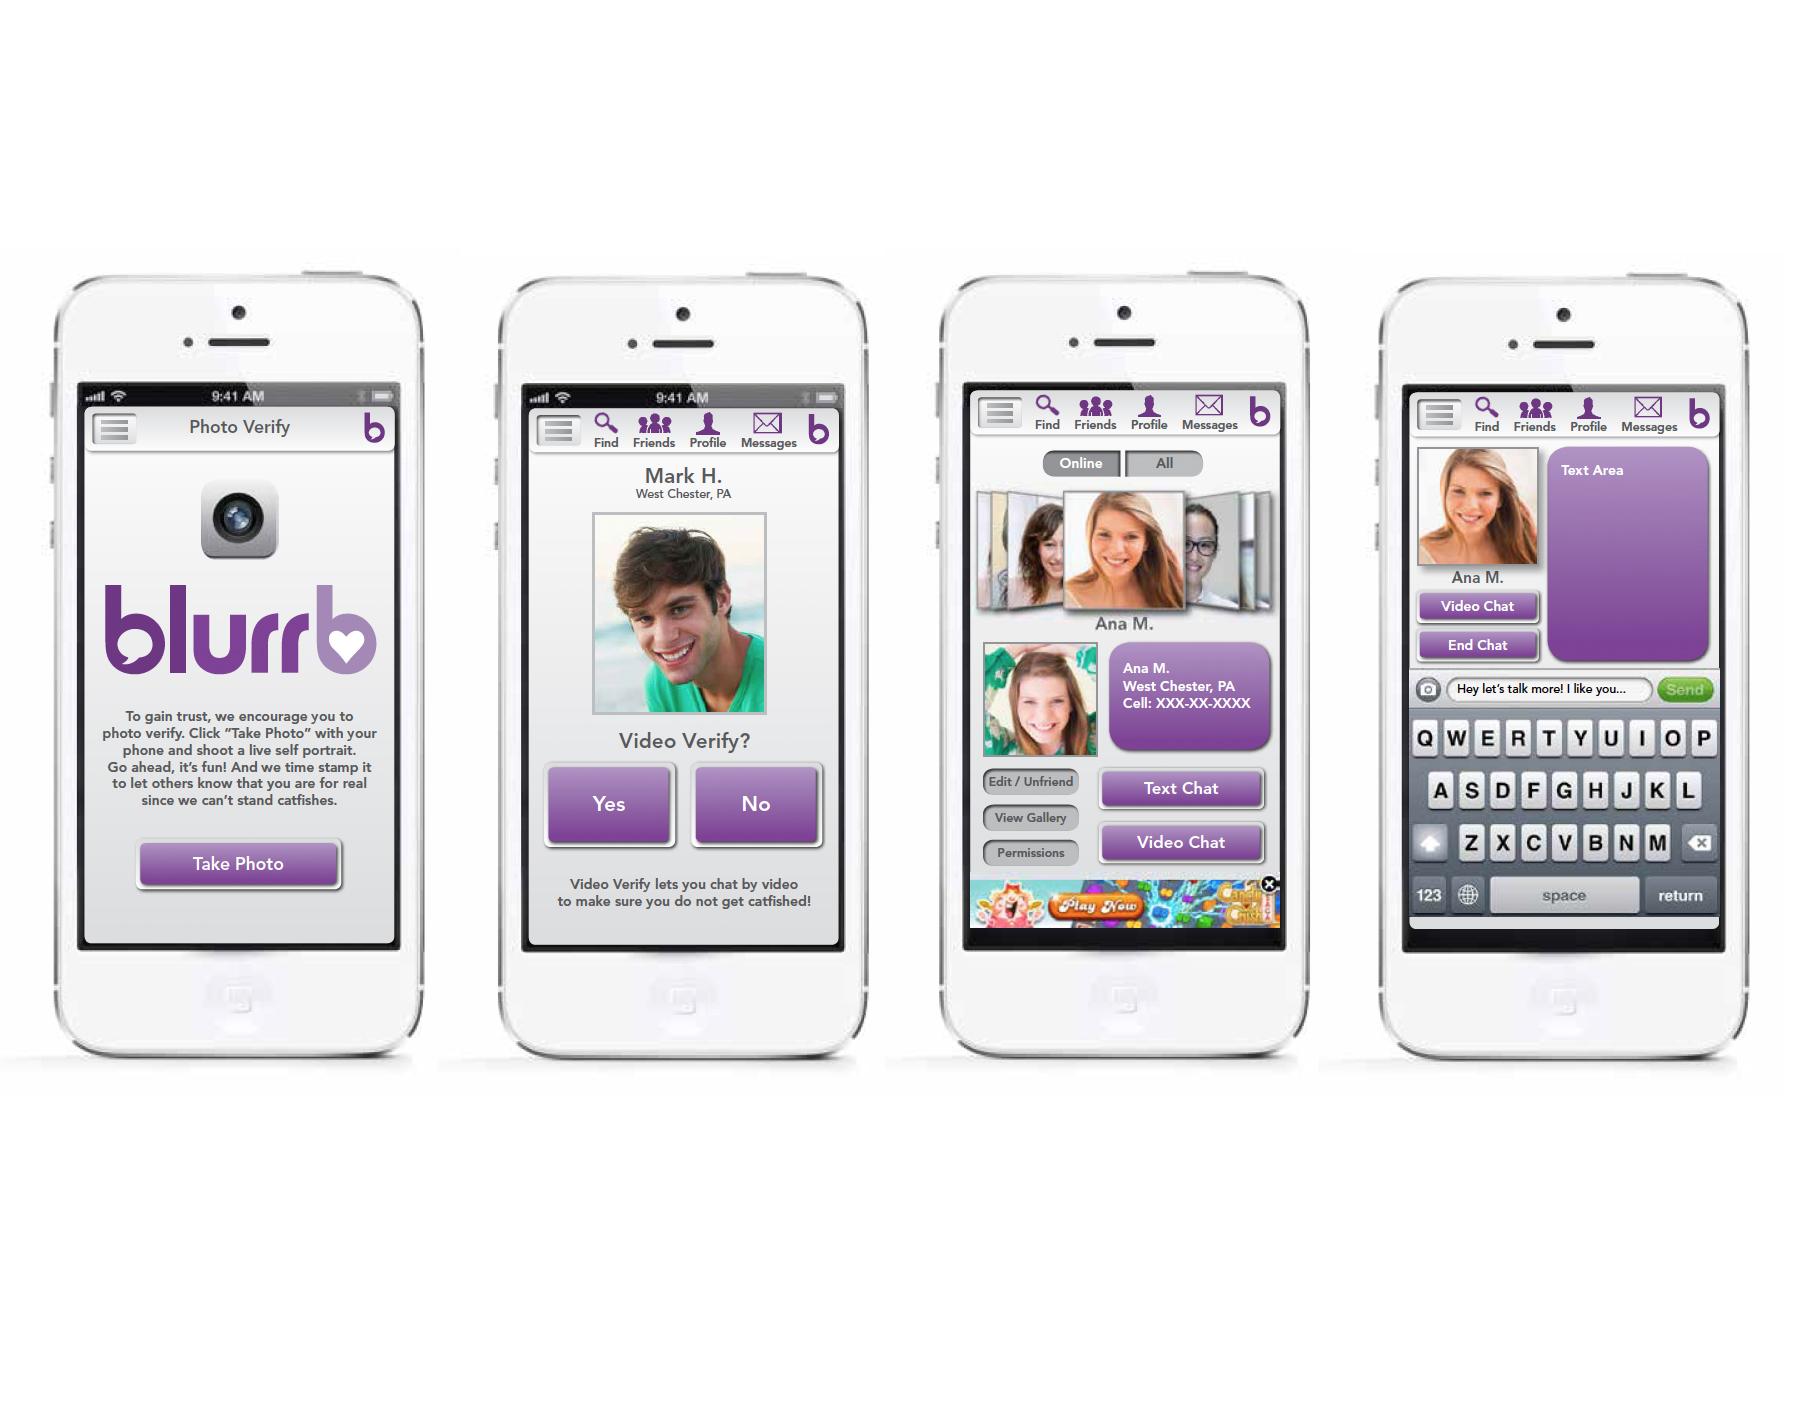 Mobile Application Design – blurb Dating App & Logo